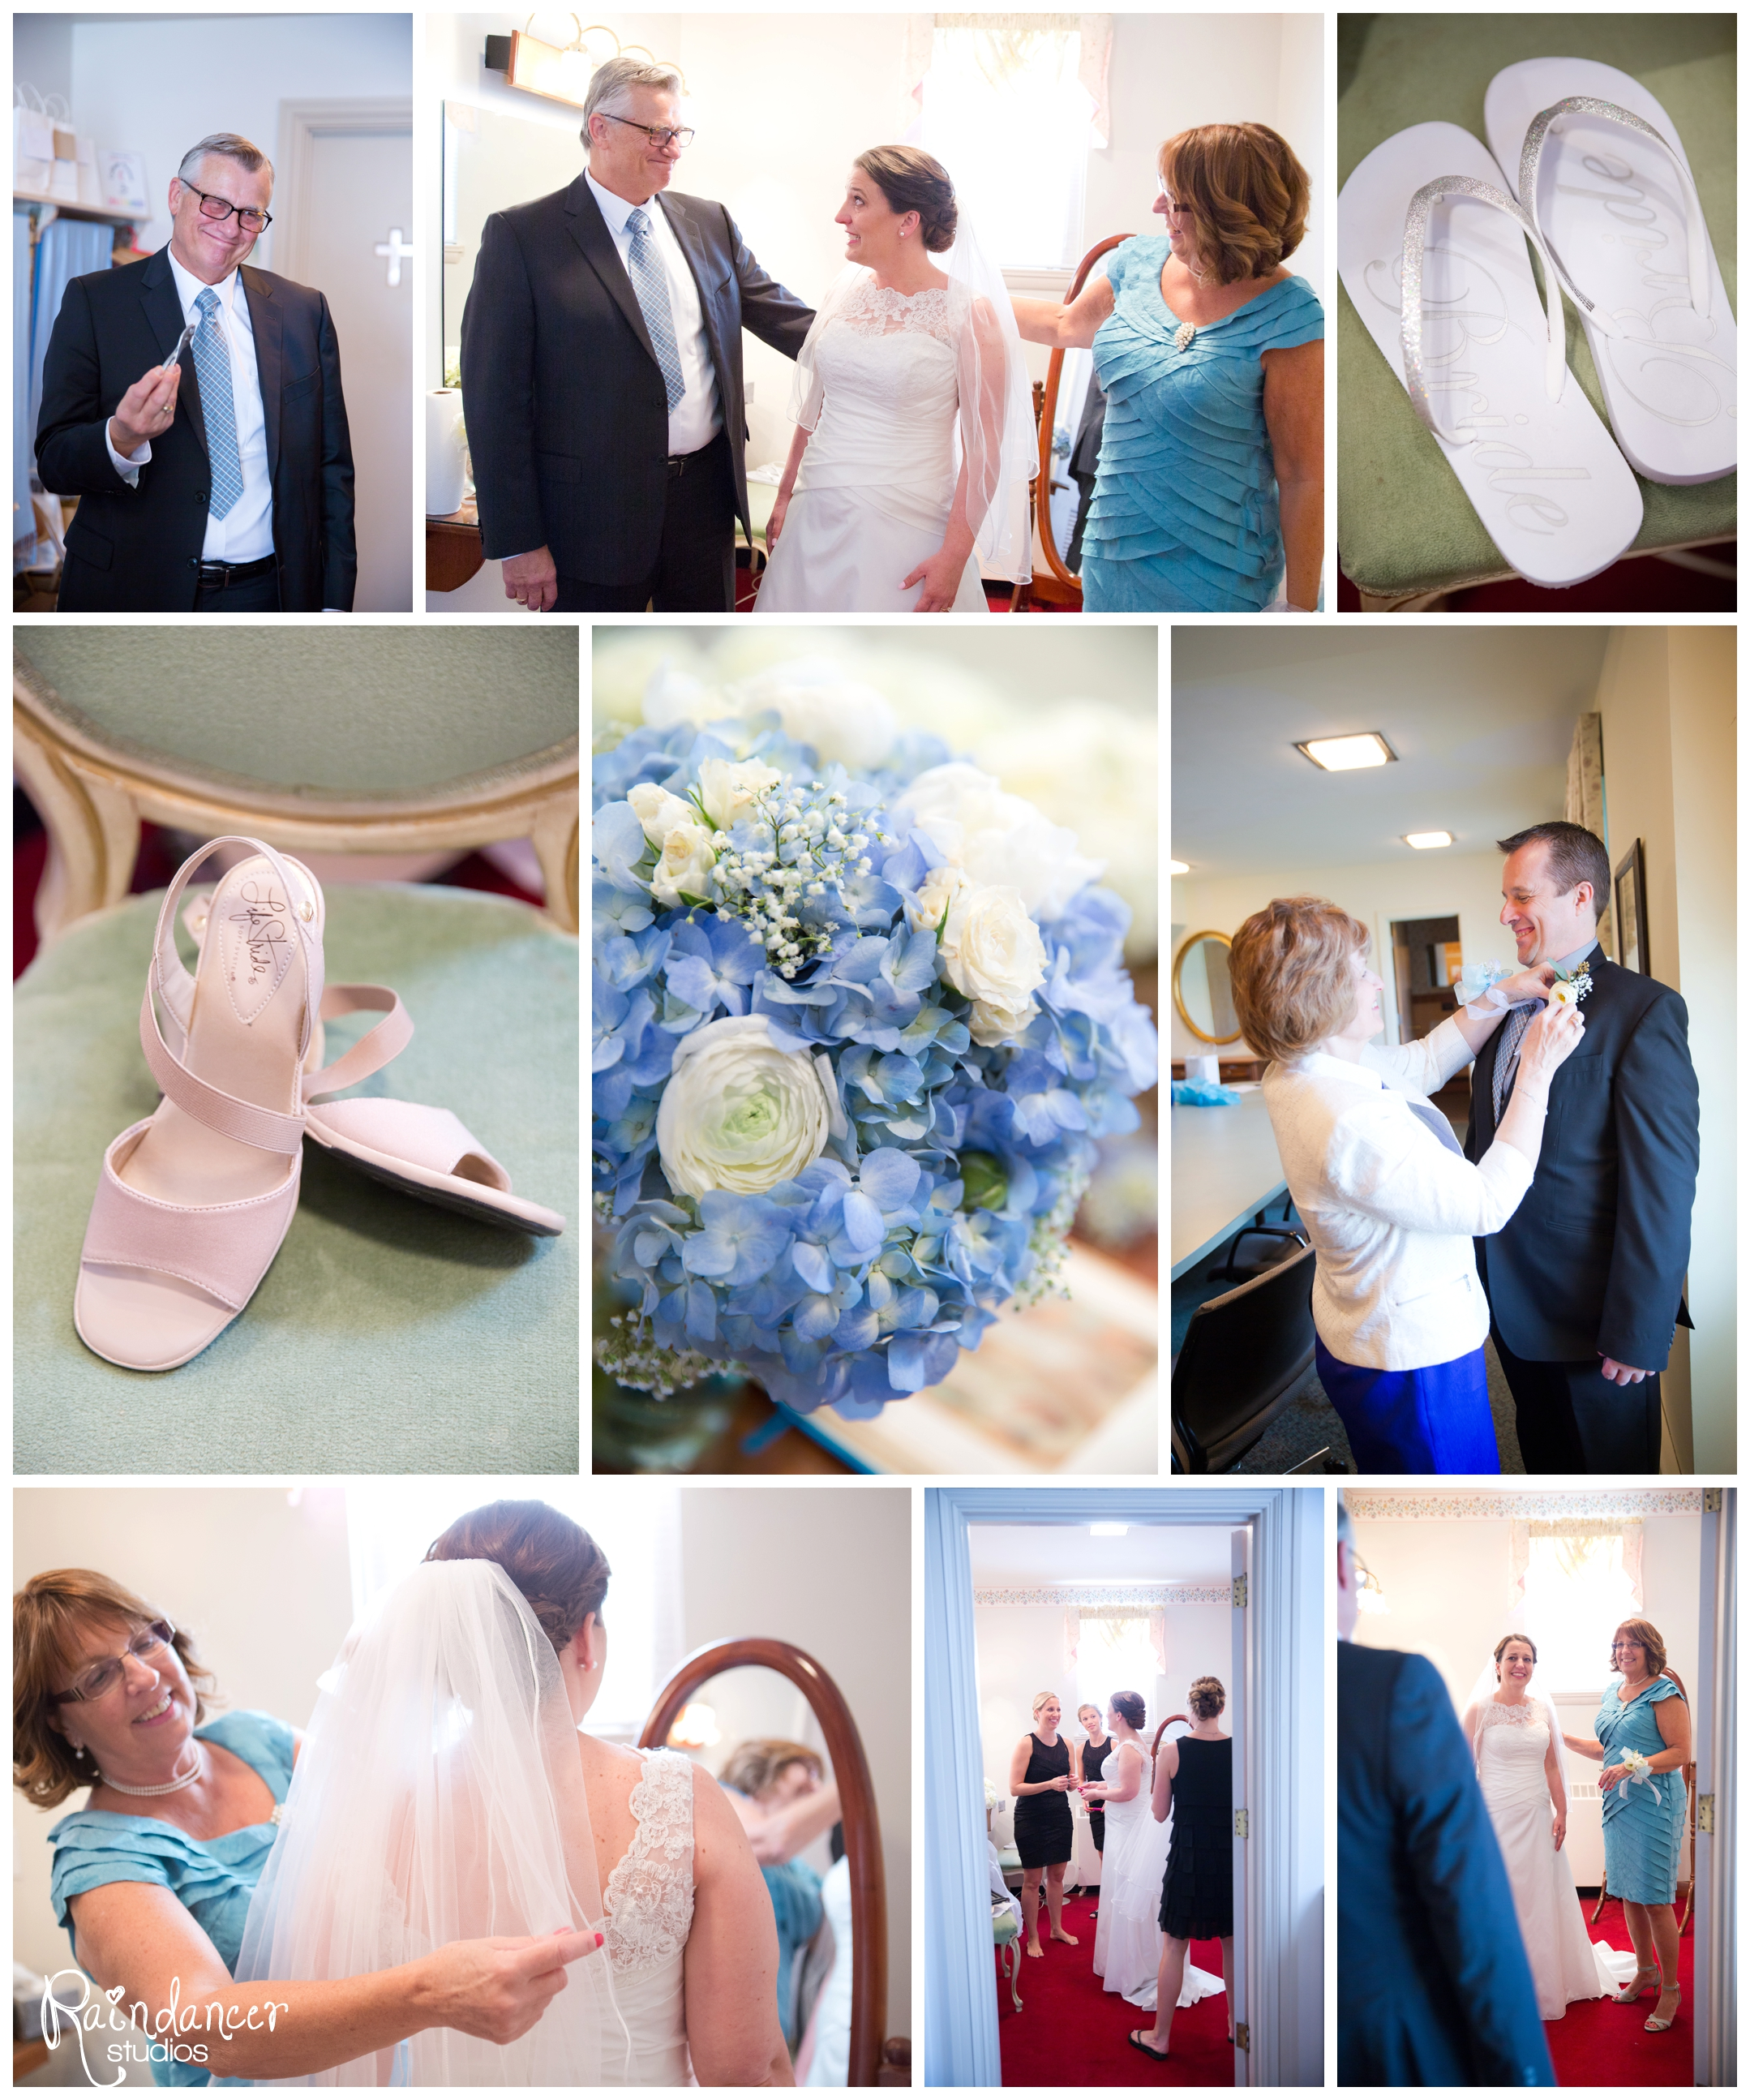 Mr. & Mrs. Marsh – Muncie, IN Wedding  {Indiana Wedding Photographer}